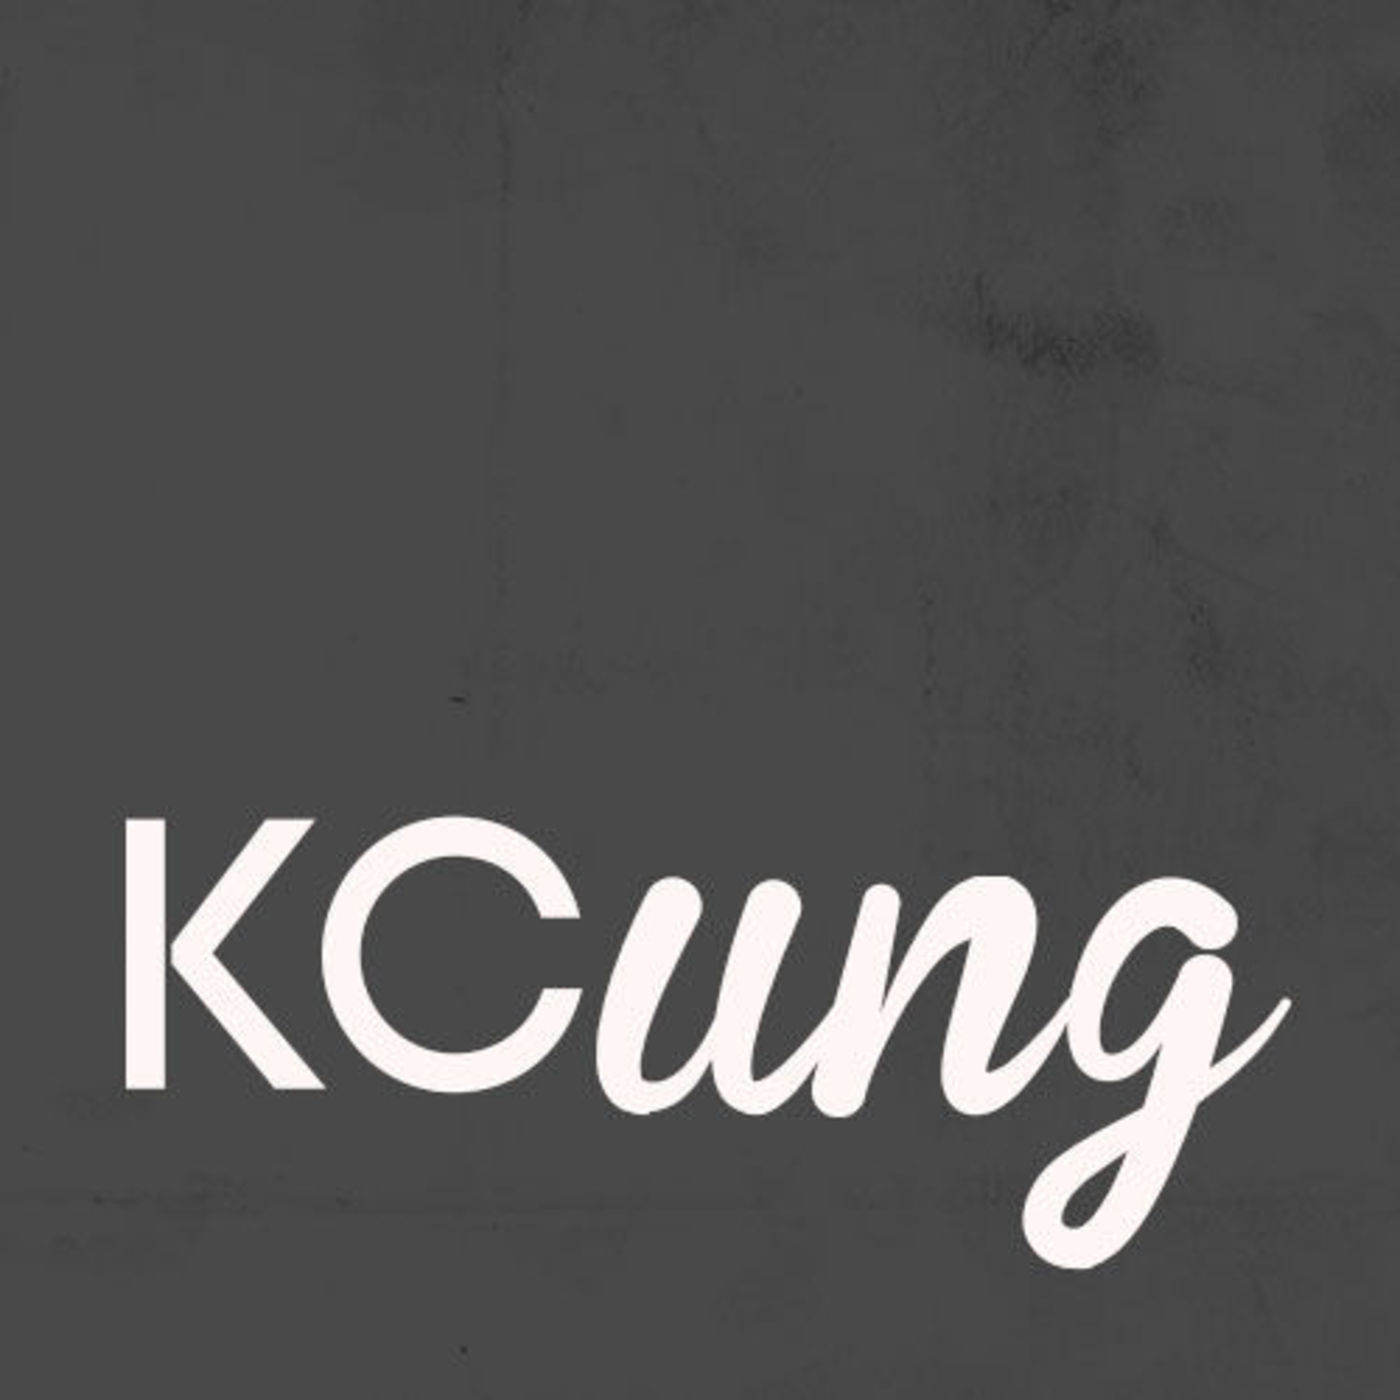 <![CDATA[KCung.se]]>